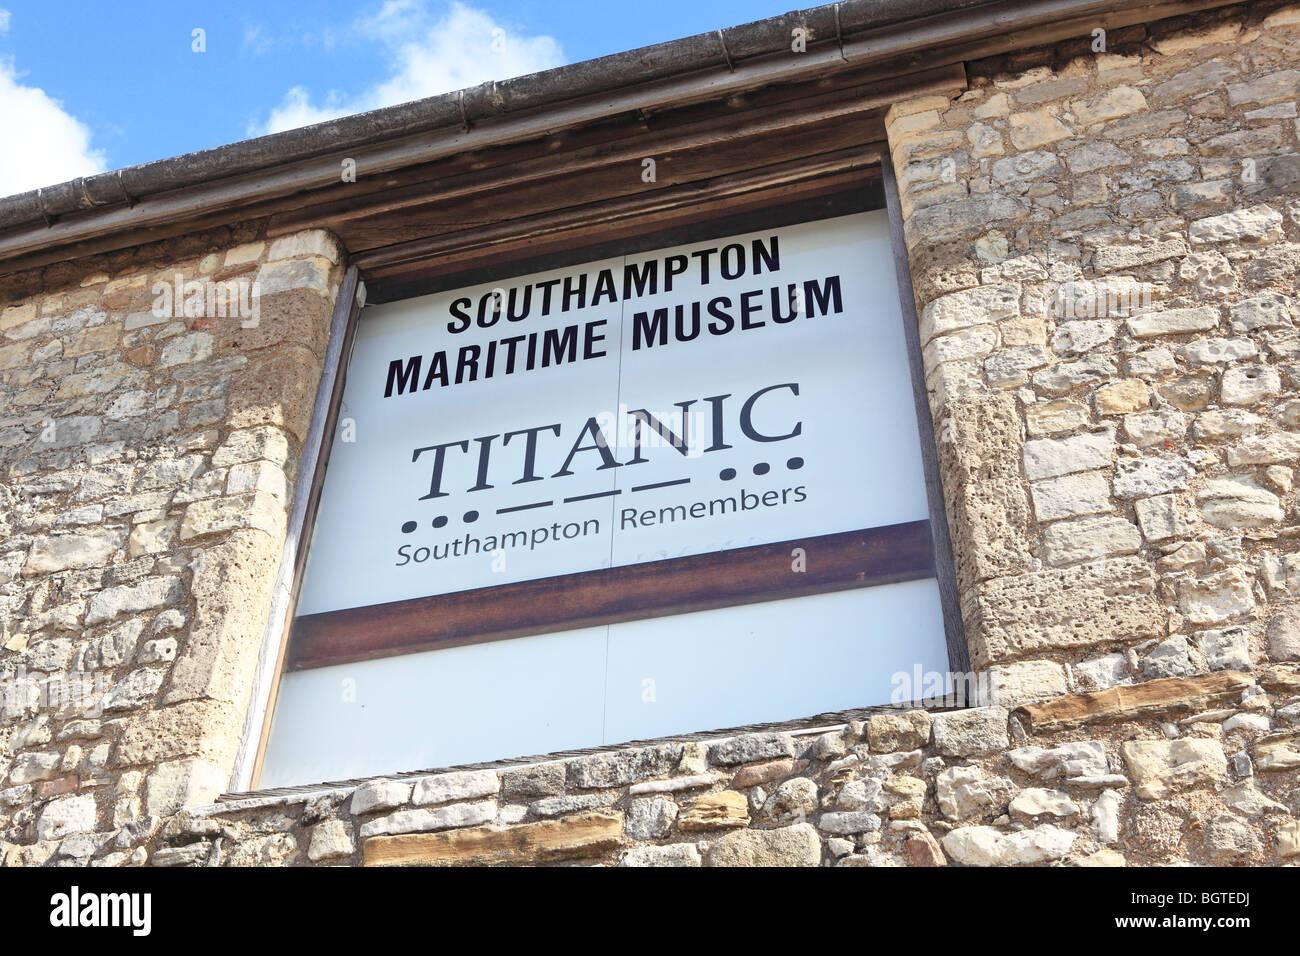 Southampton Maritime Museum Titanic Exhibition Stock Photo Alamy